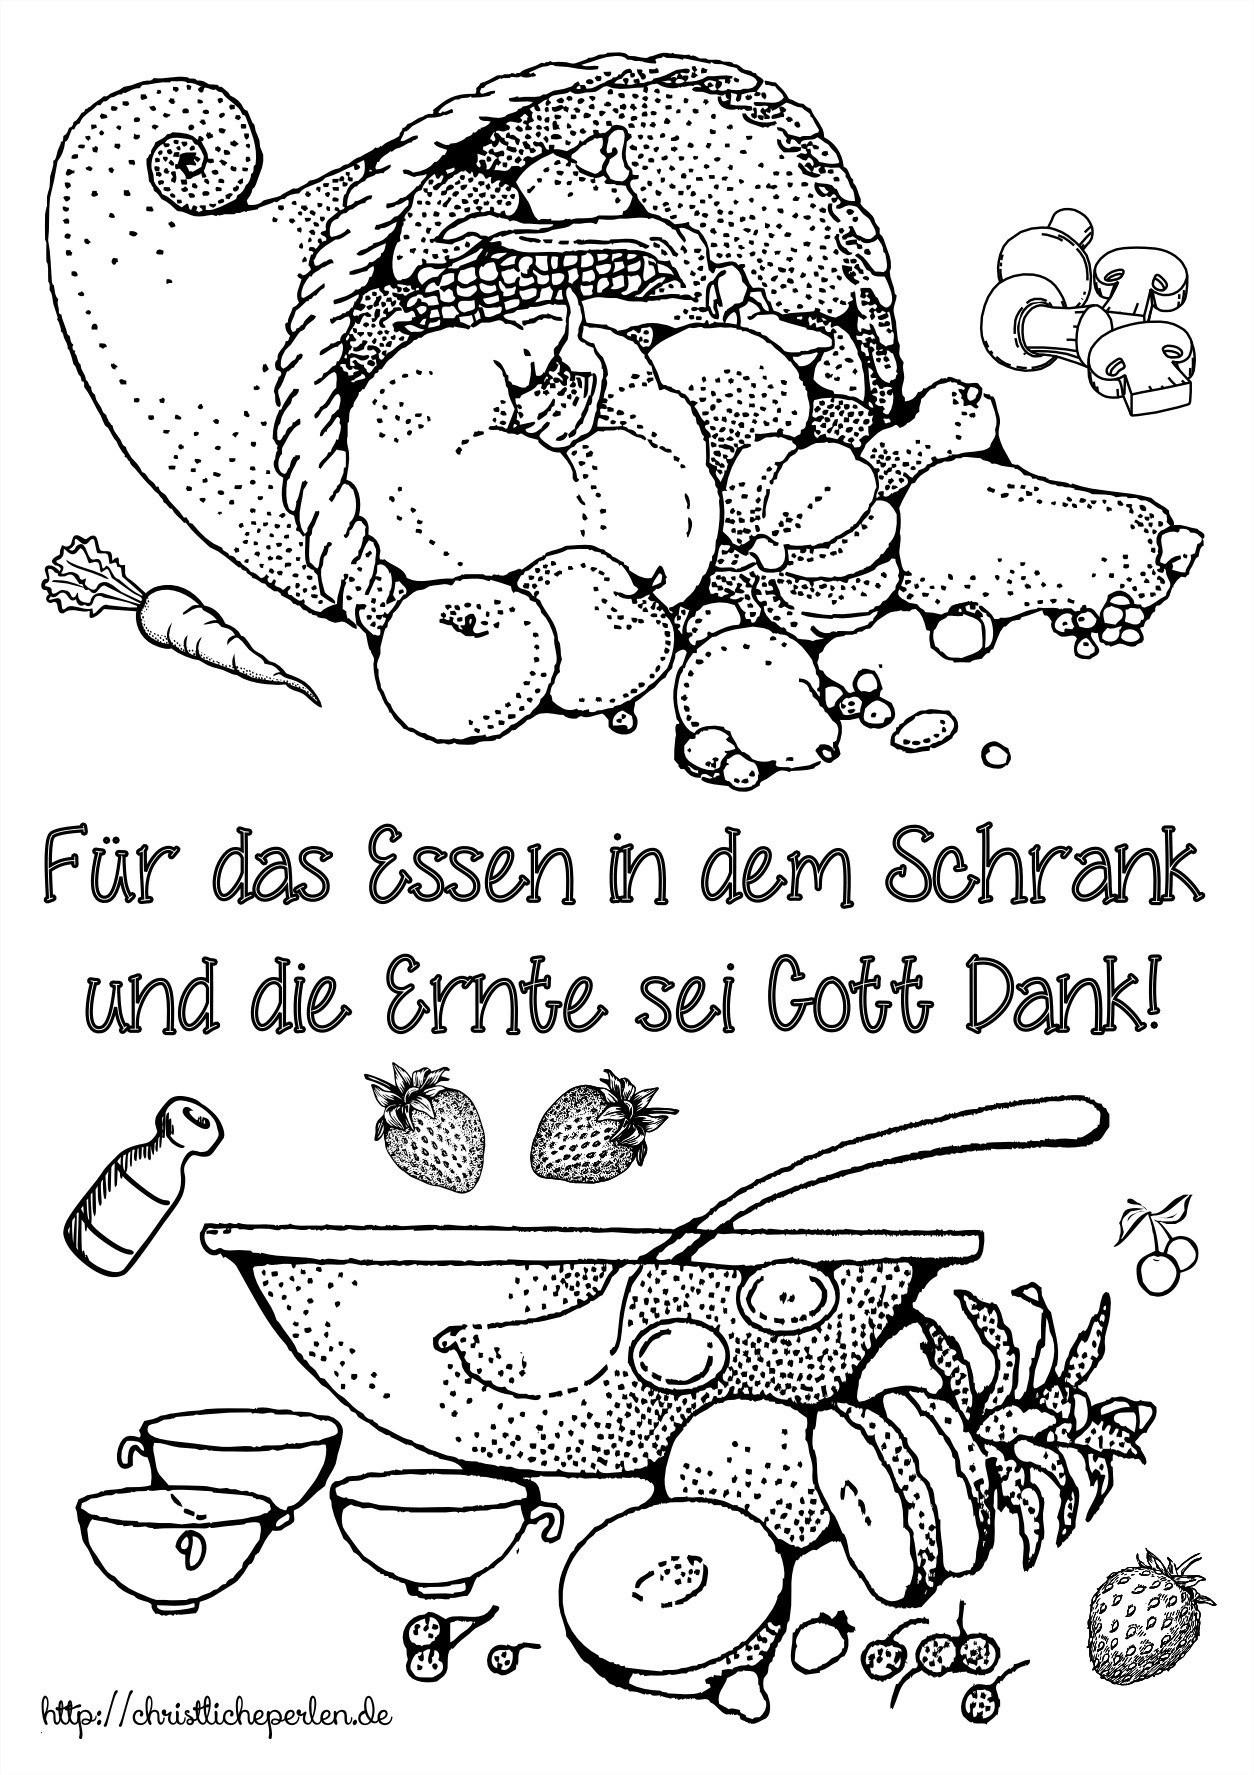 Minions Ausmalbilder Bob Teddy Genial 40 Janosch Ausmalbilder Scoredatscore Schön Minion Ausmalbilder Zum Stock